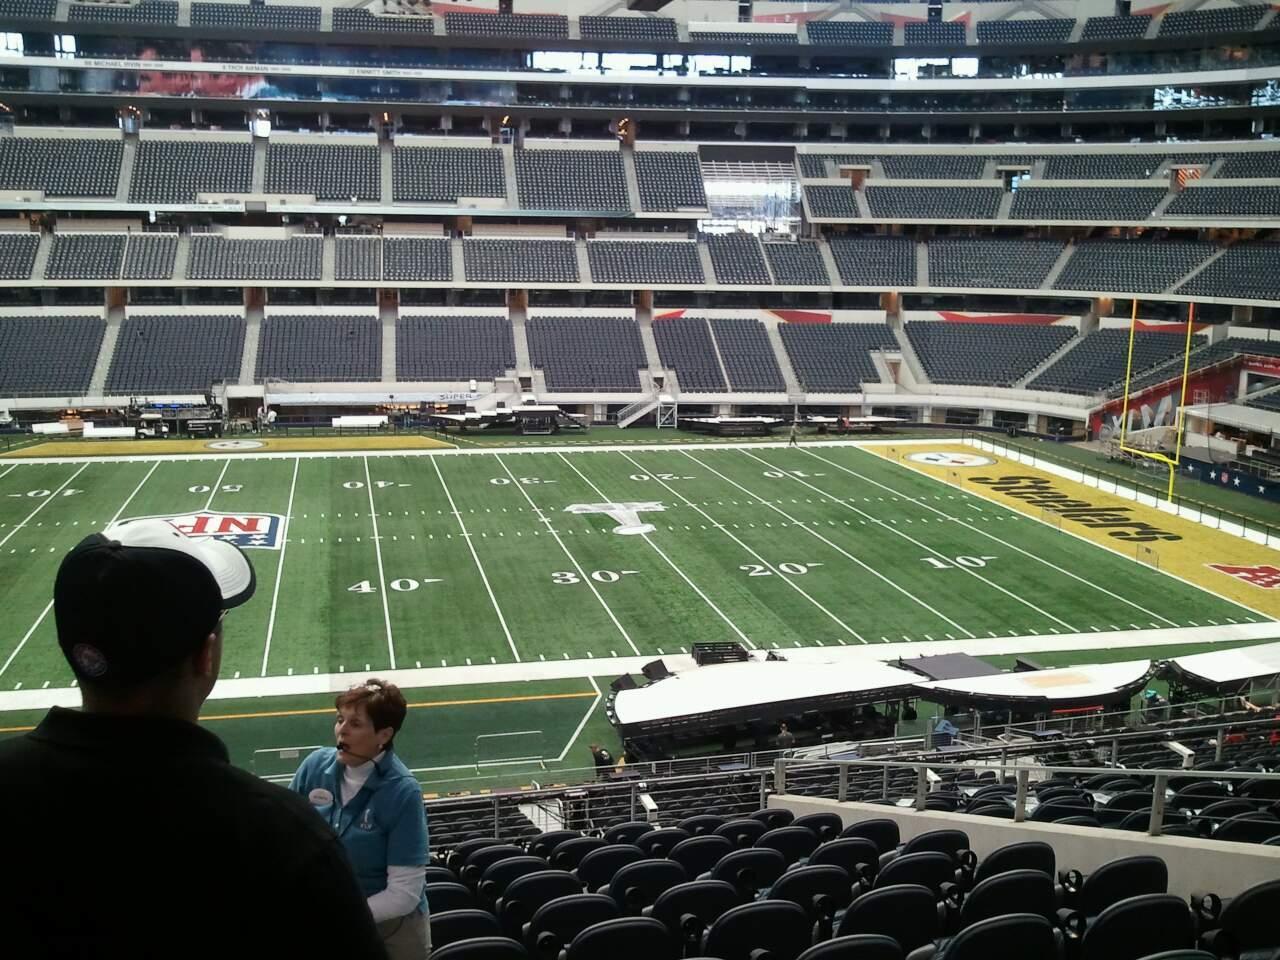 AT&T Stadium Secção C210 Fila 9 Lugar 20